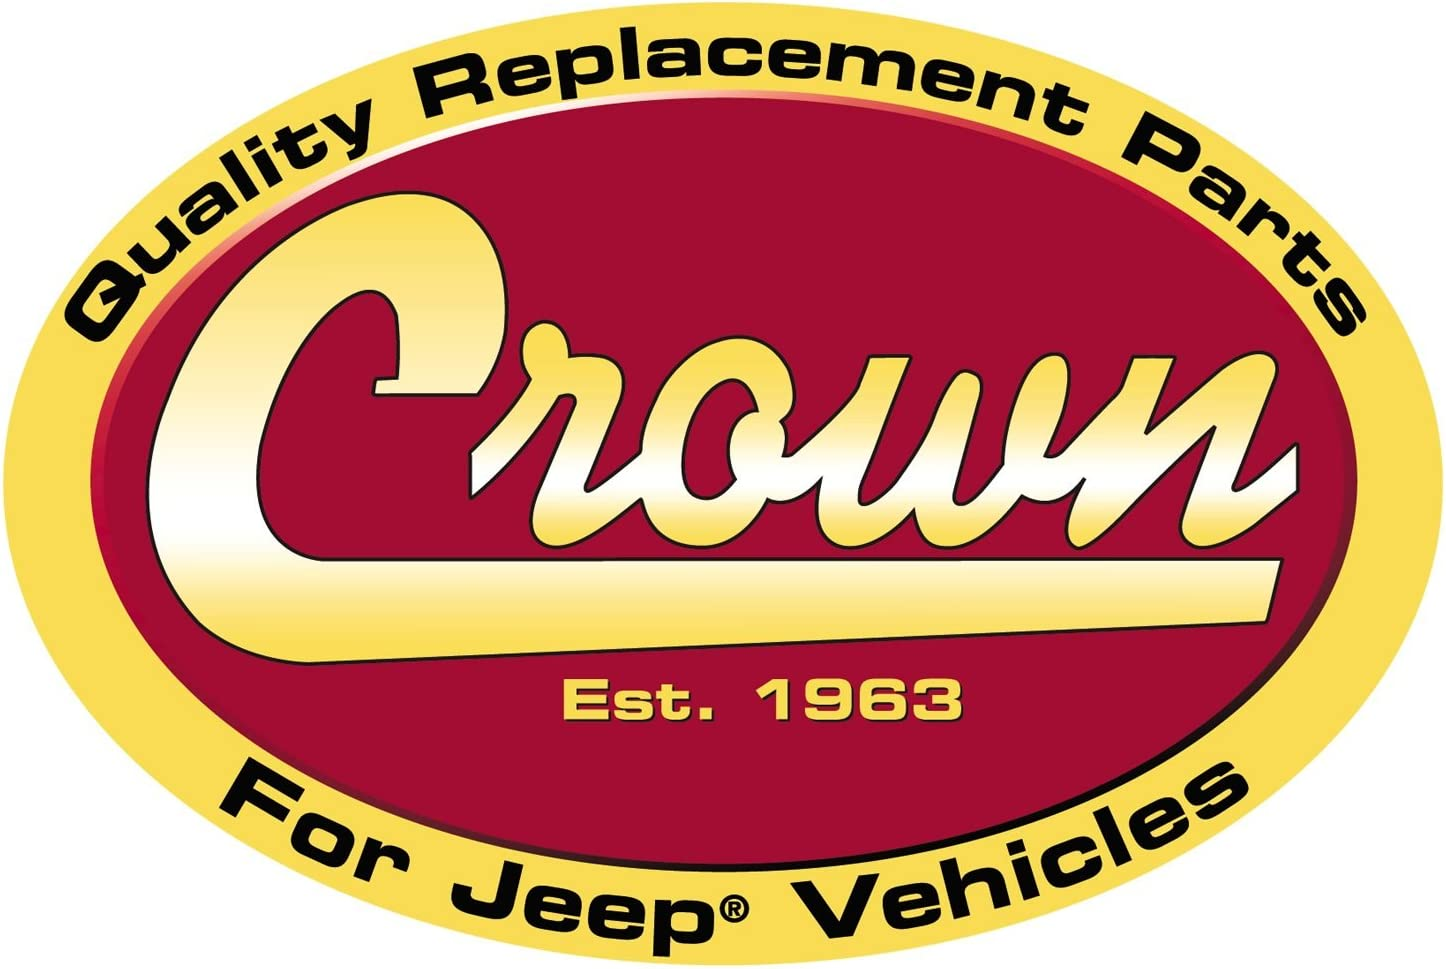 Crown Industry No. 1 Automotive Brake Kit Caliper Rebuild Gifts